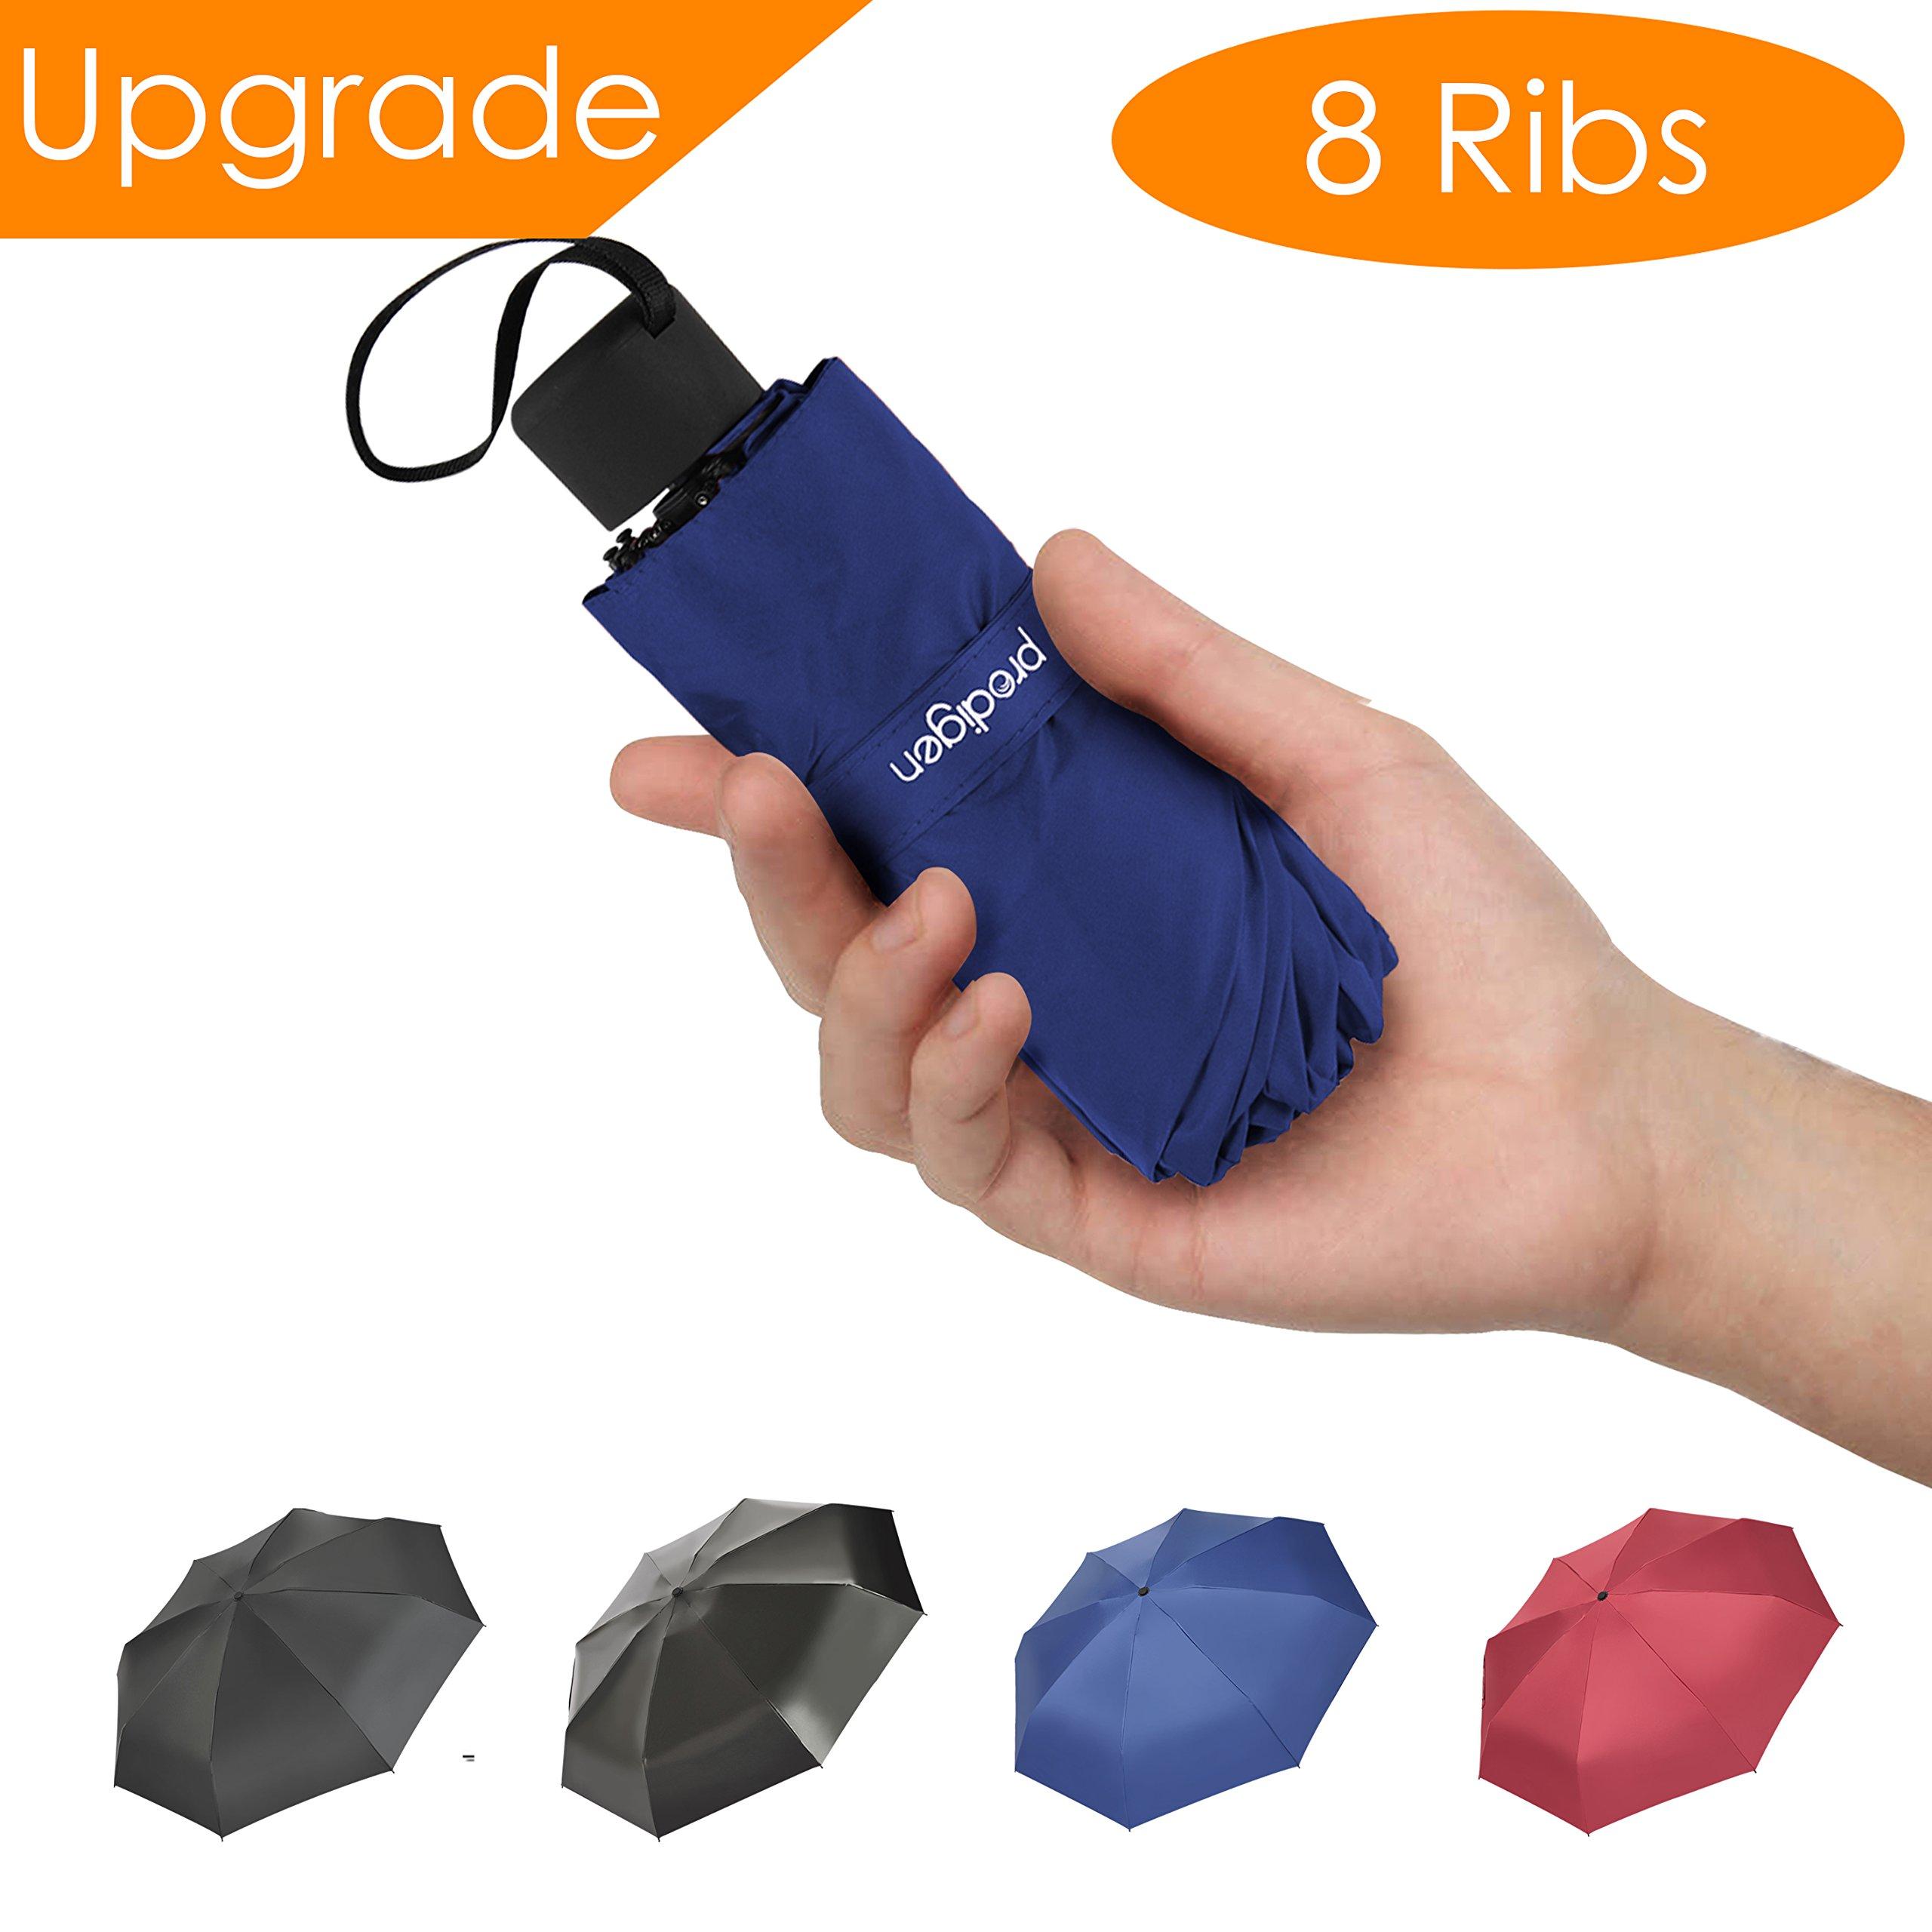 Prodigen Travel Mini Umbrella Windproof UV Folding Compact Umbrella Portable Lightweight Sun & Rain Umbrellas for Women and Men (Blue)